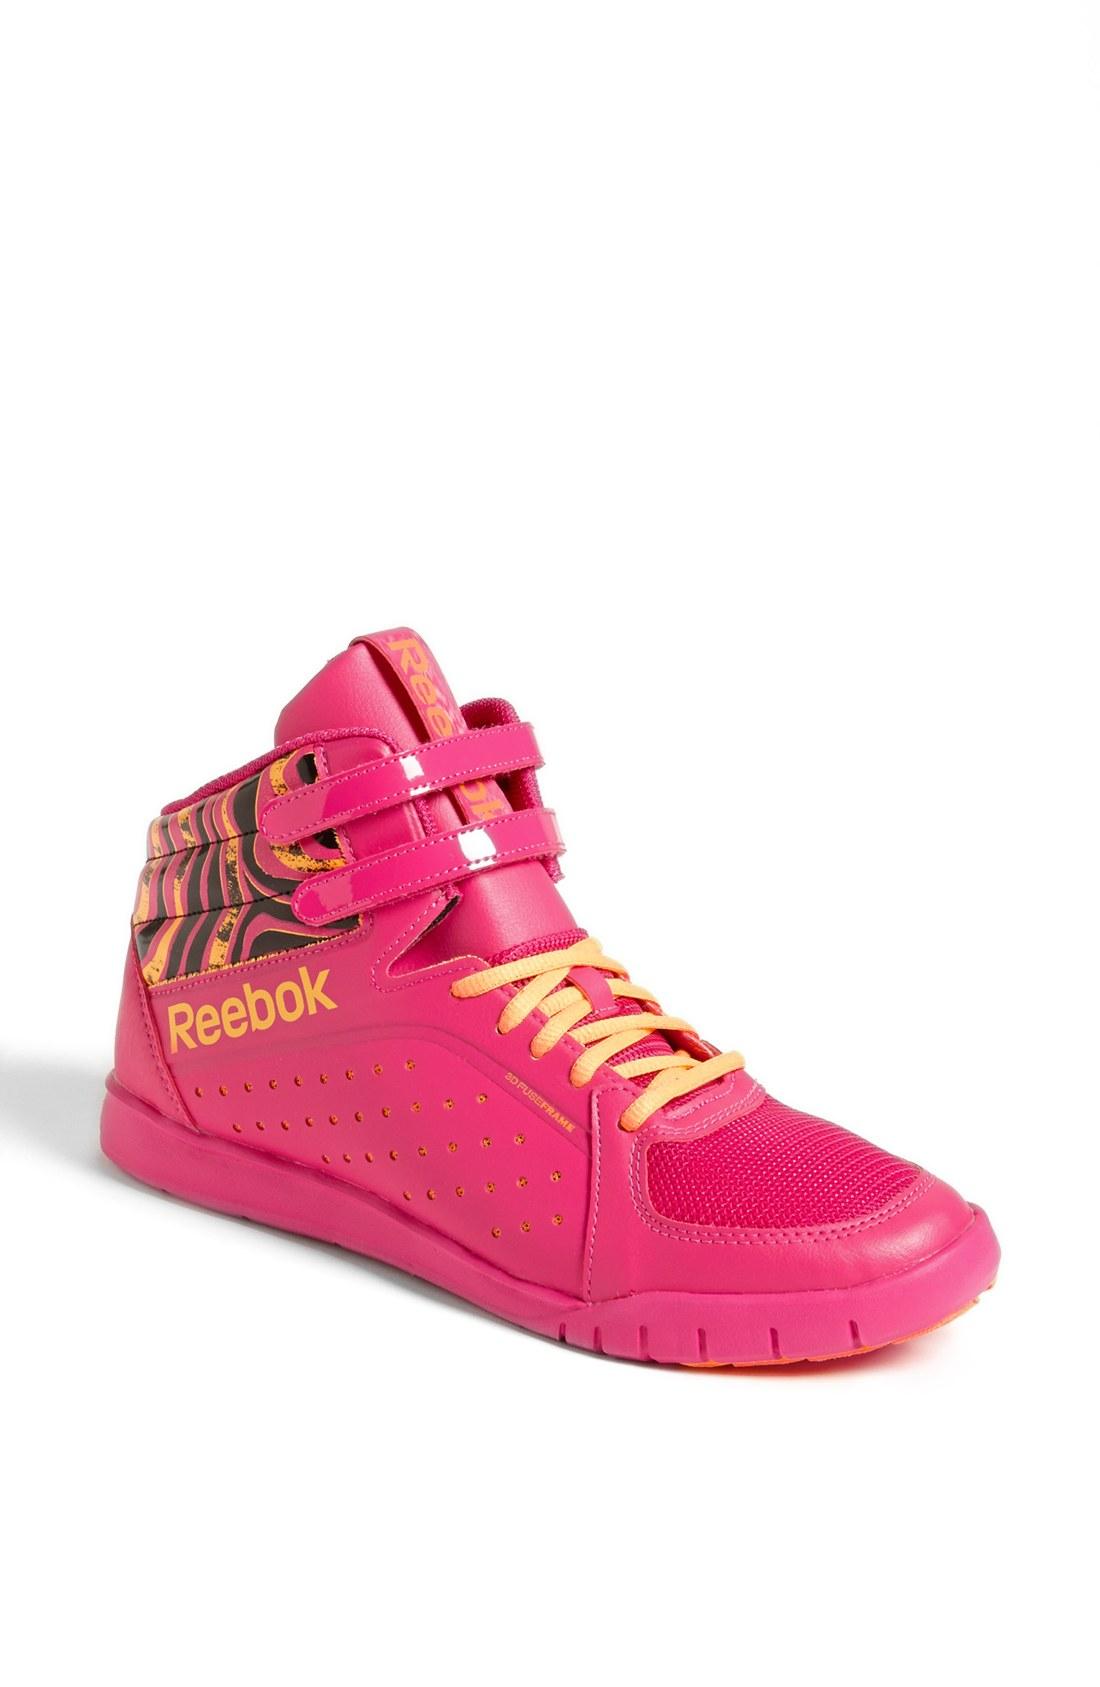 reebok urlead mid 20 shoe in pink pink